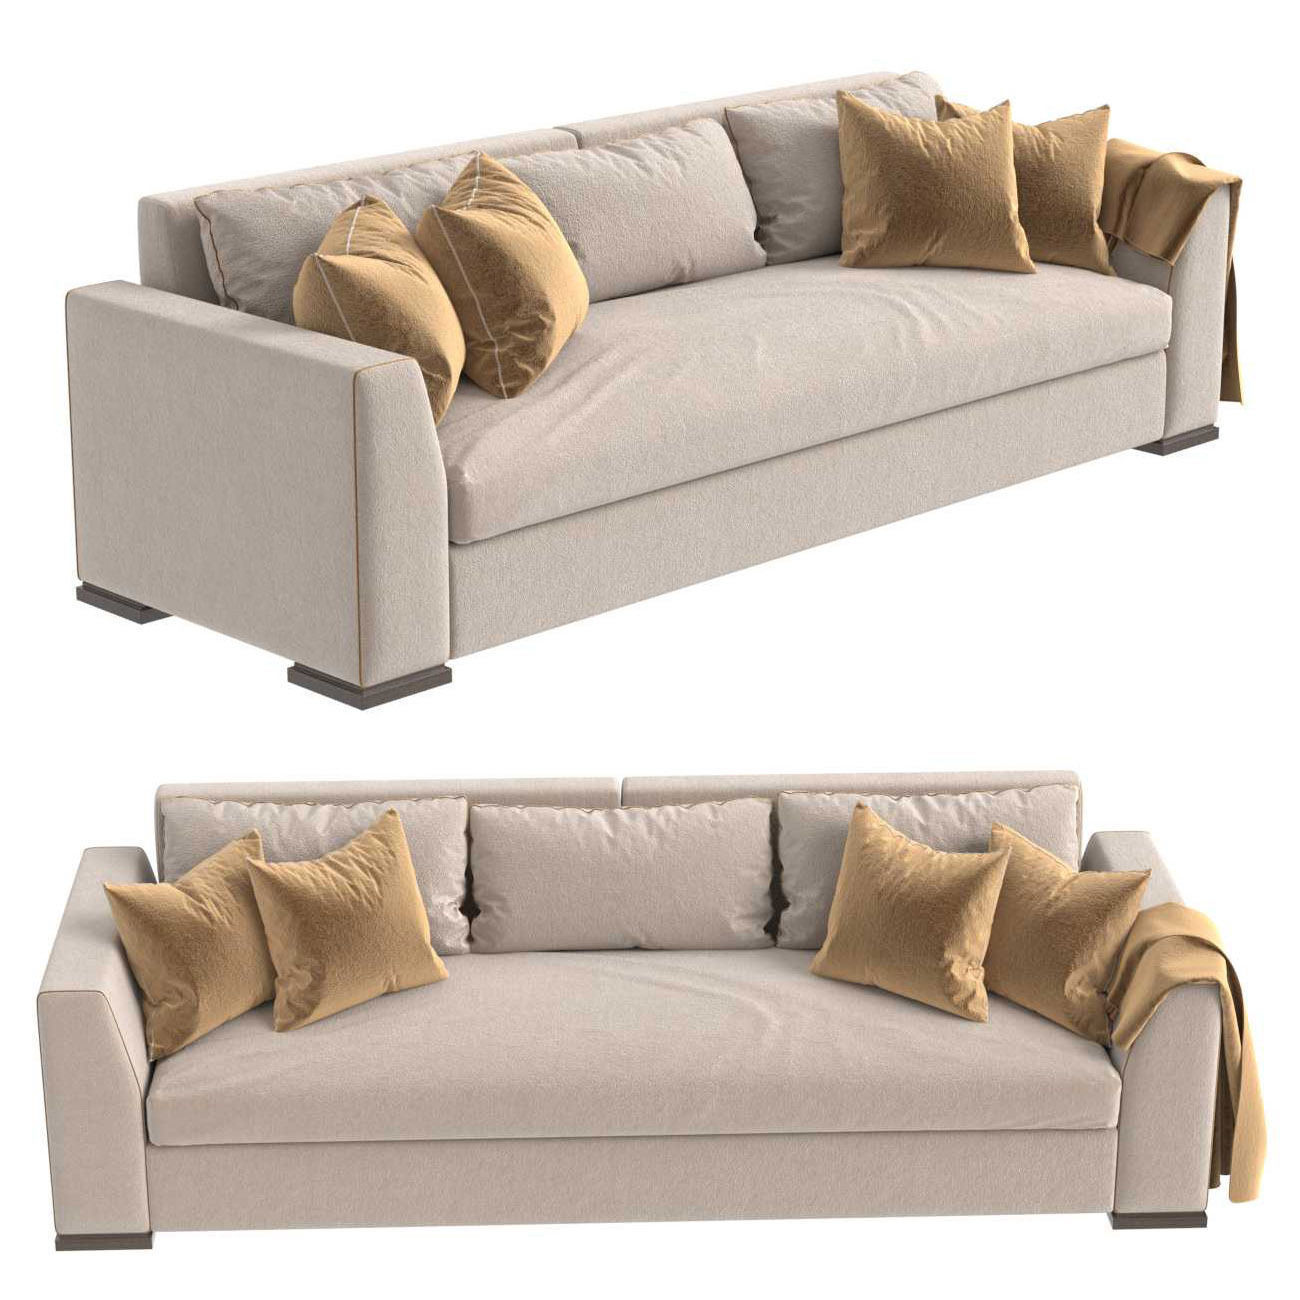 Custom three seat sofa in beige upholstery